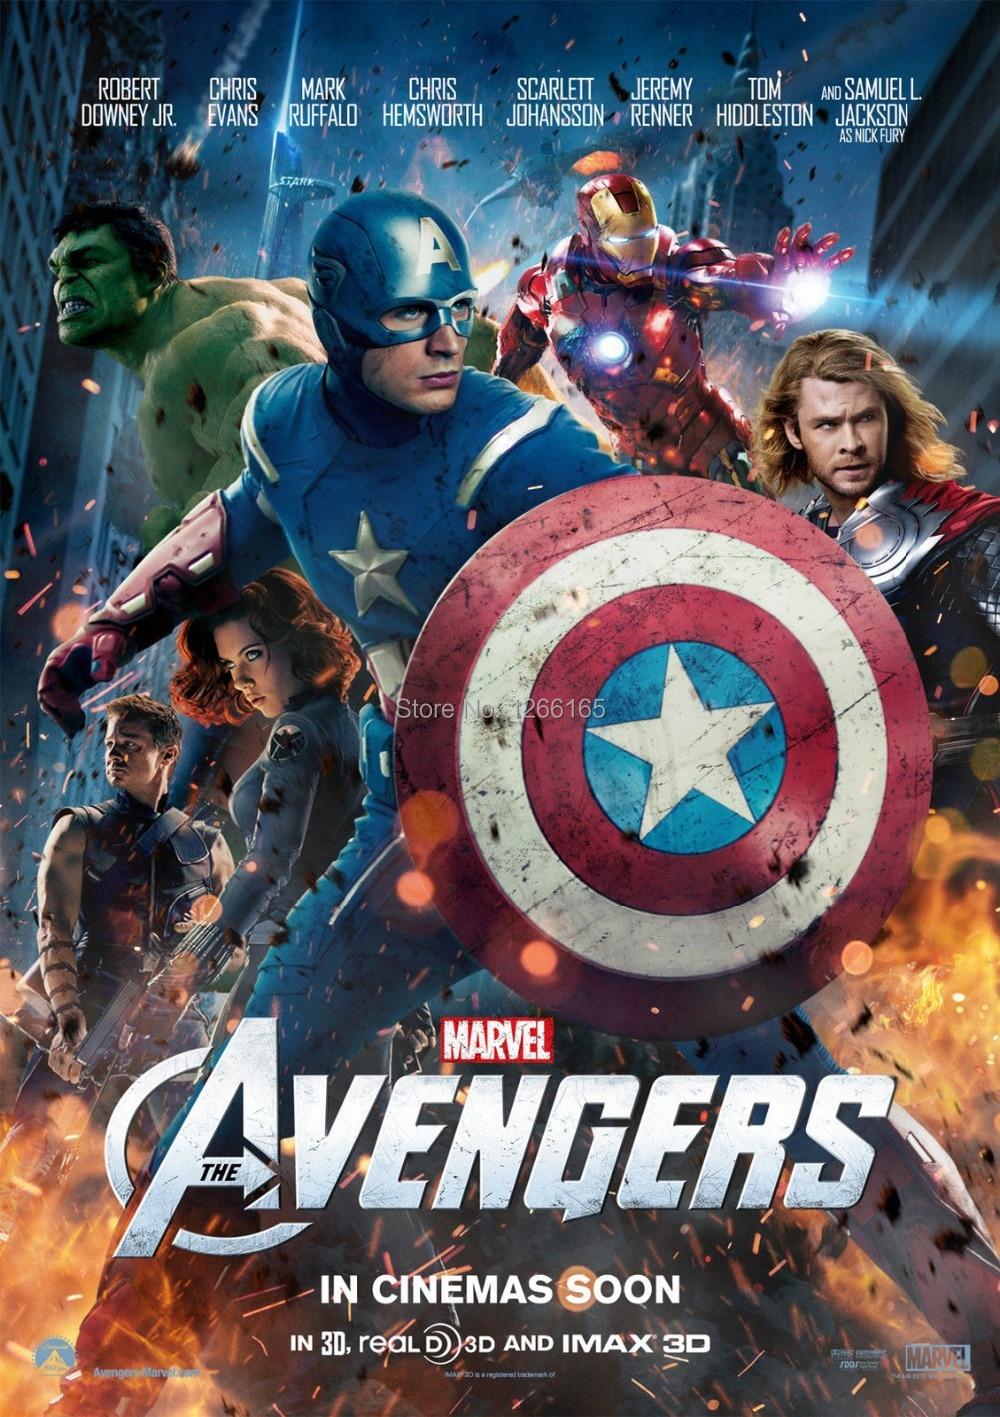 Chris Hemsworth Art Silk Poster 12x18 24x36